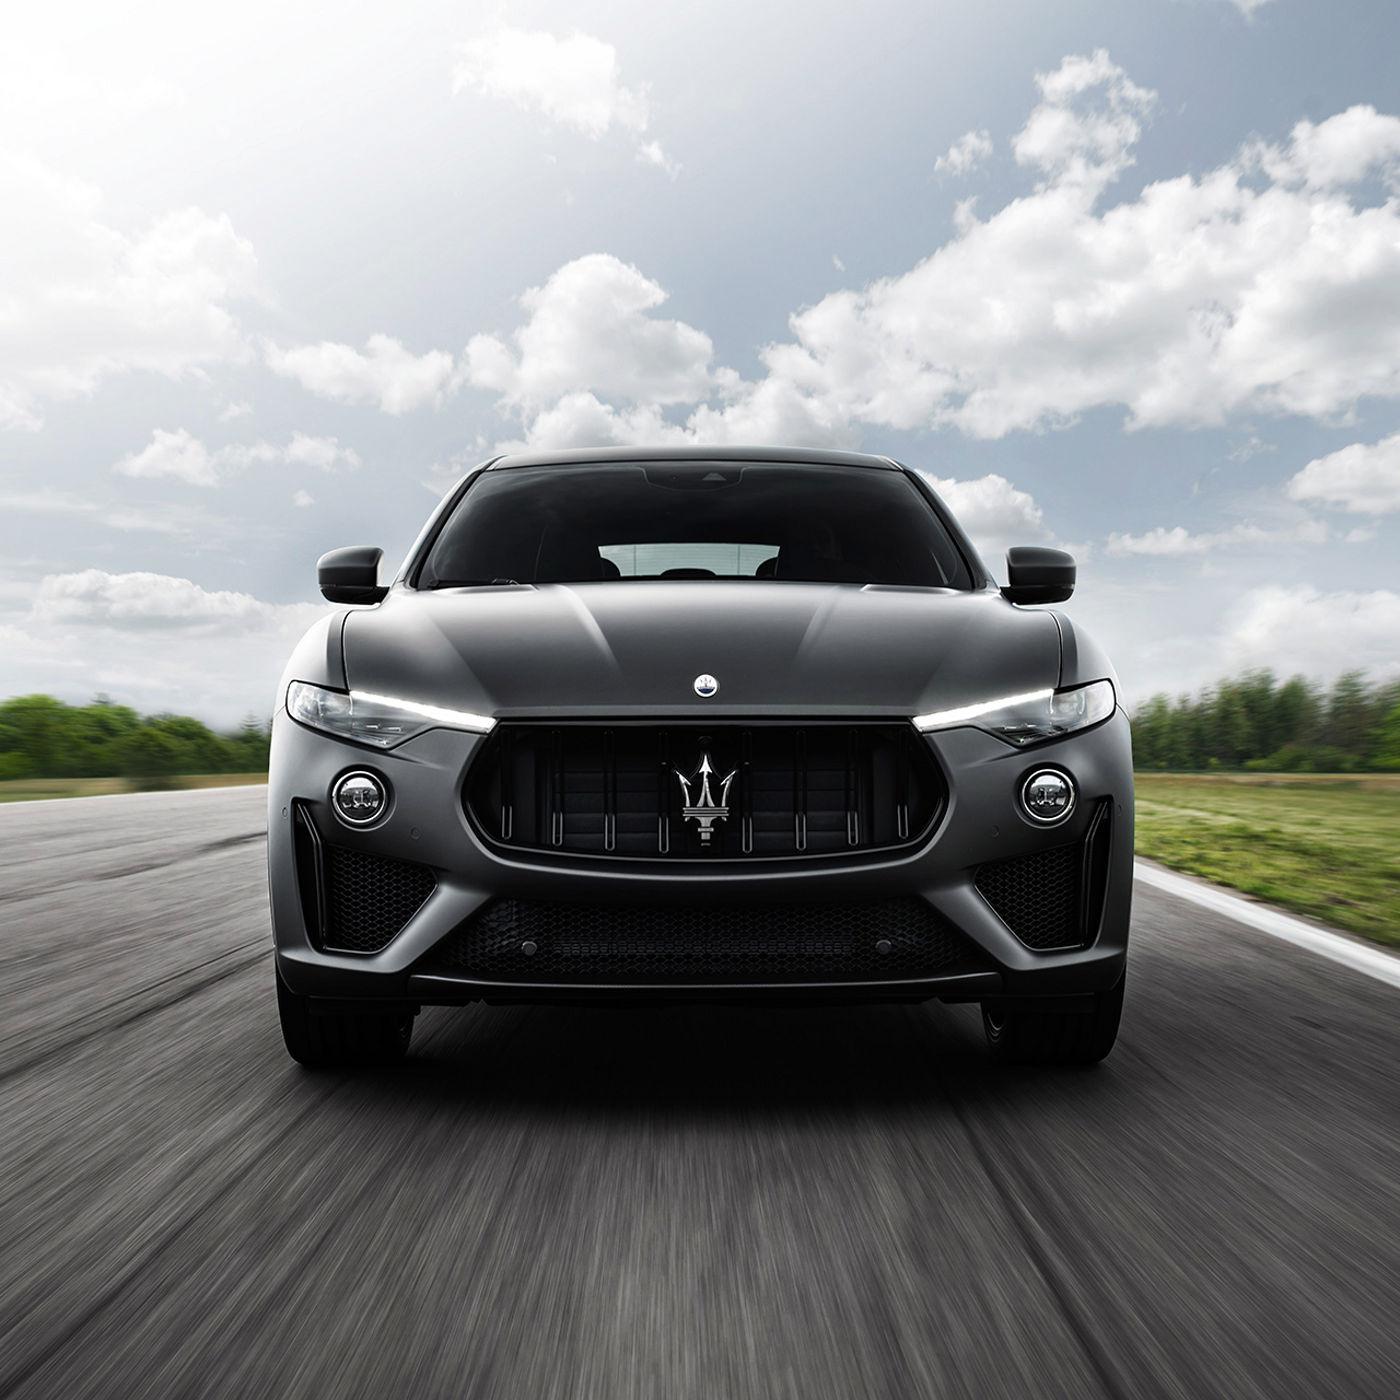 Maserati Levante Trofeo – the luxury SUV from front